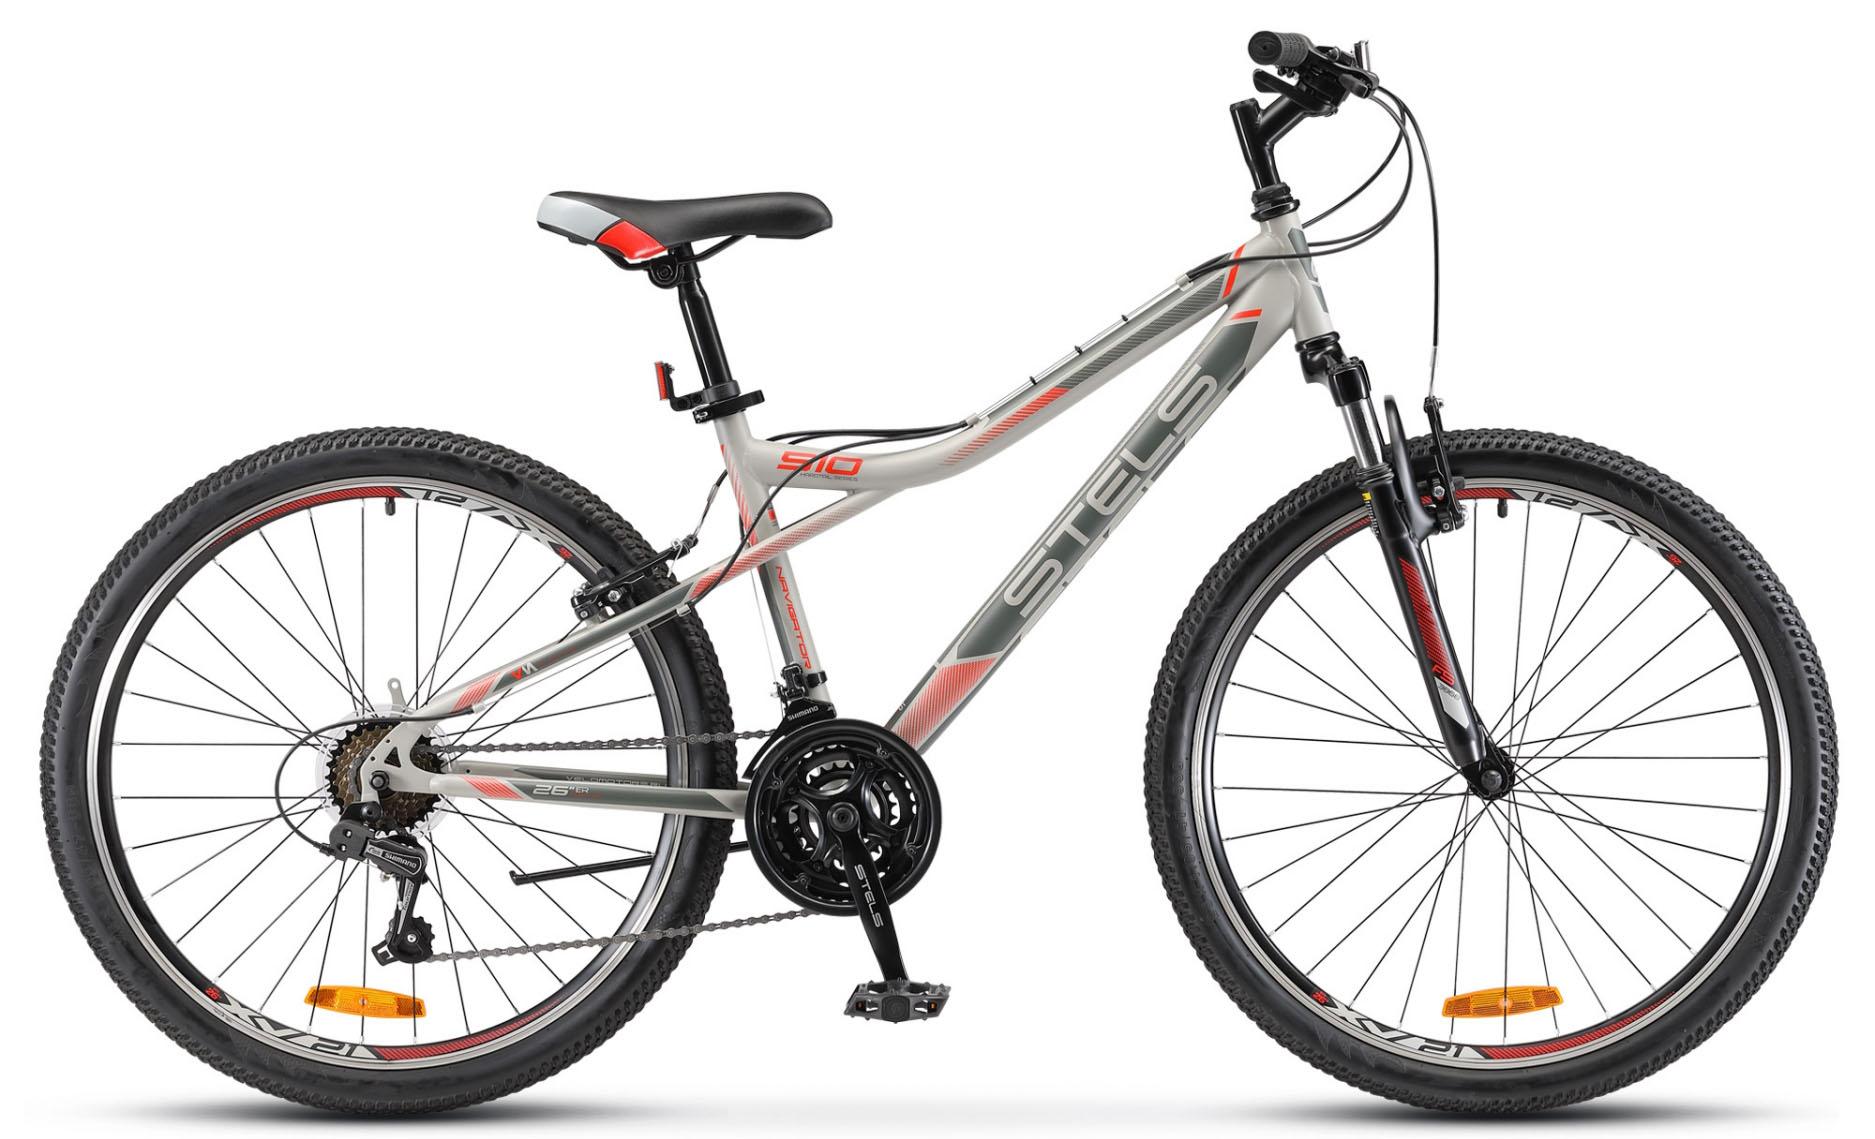 Велосипед Stels Navigator-510 V 26 V030 2018 велосипед stels navigator 670 md 2015